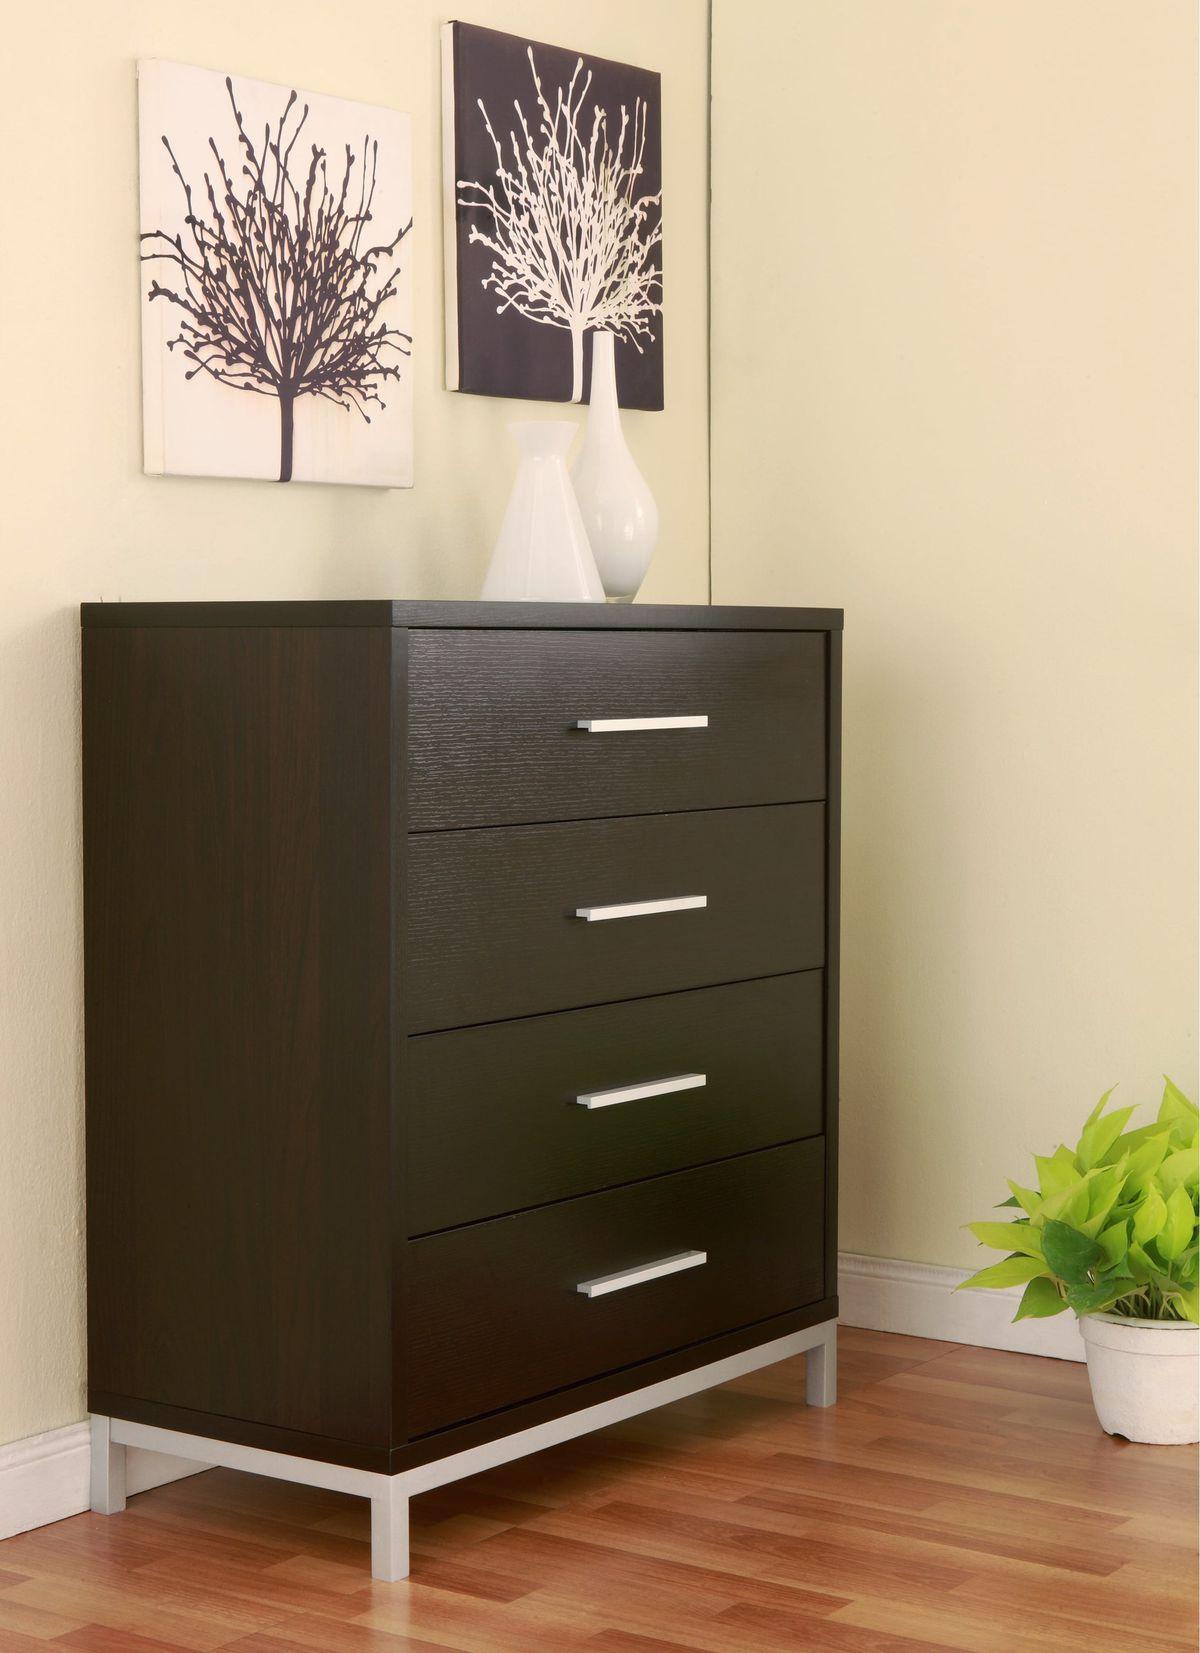 Ikea Malm Dresser Alternatives 7 Fab Styles To Shop Now